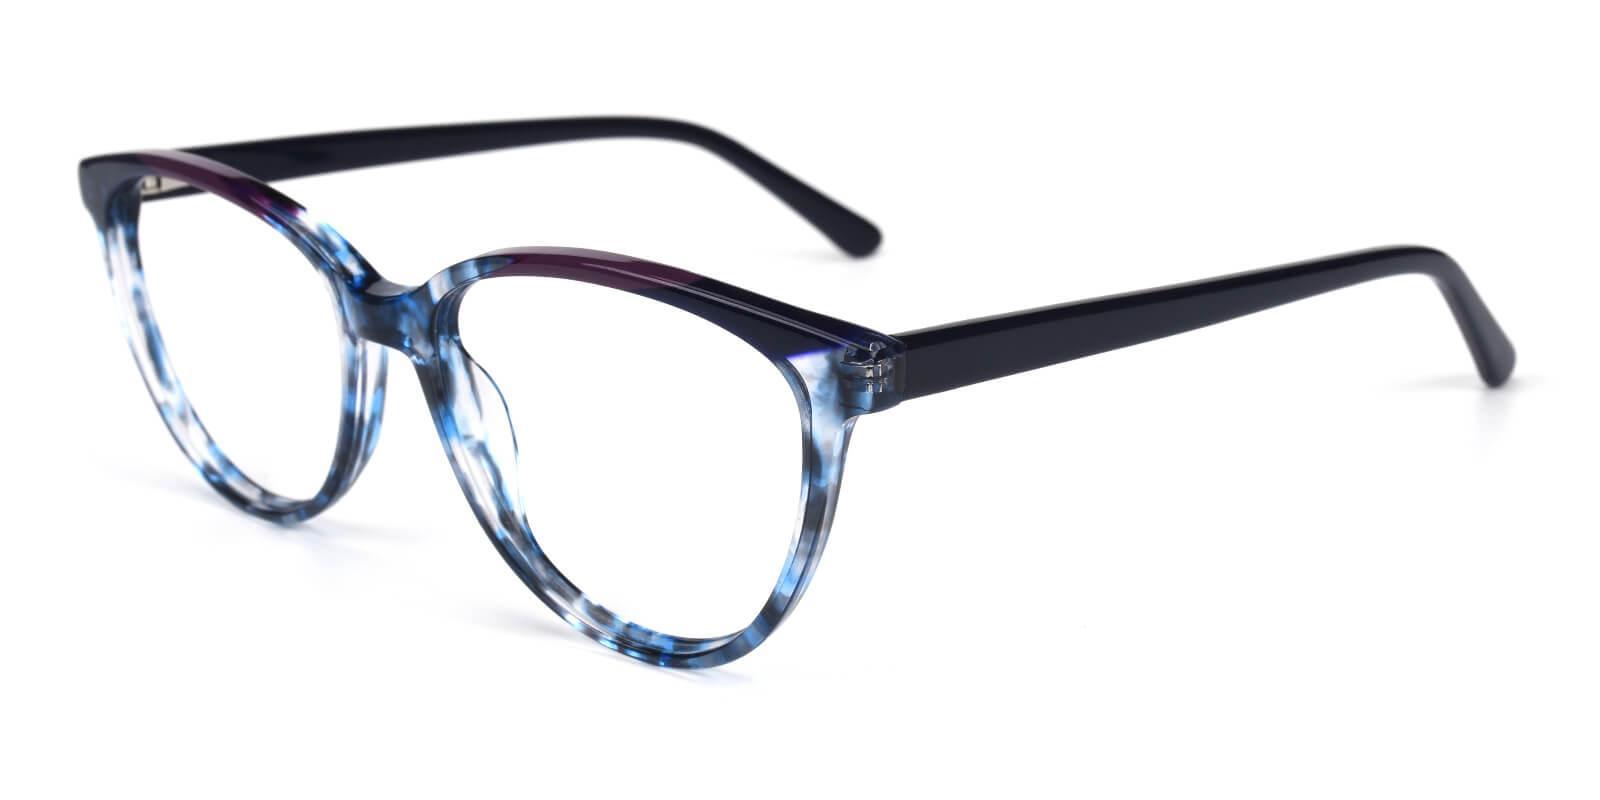 Caleb-Striped-Cat-Acetate-Eyeglasses-detail